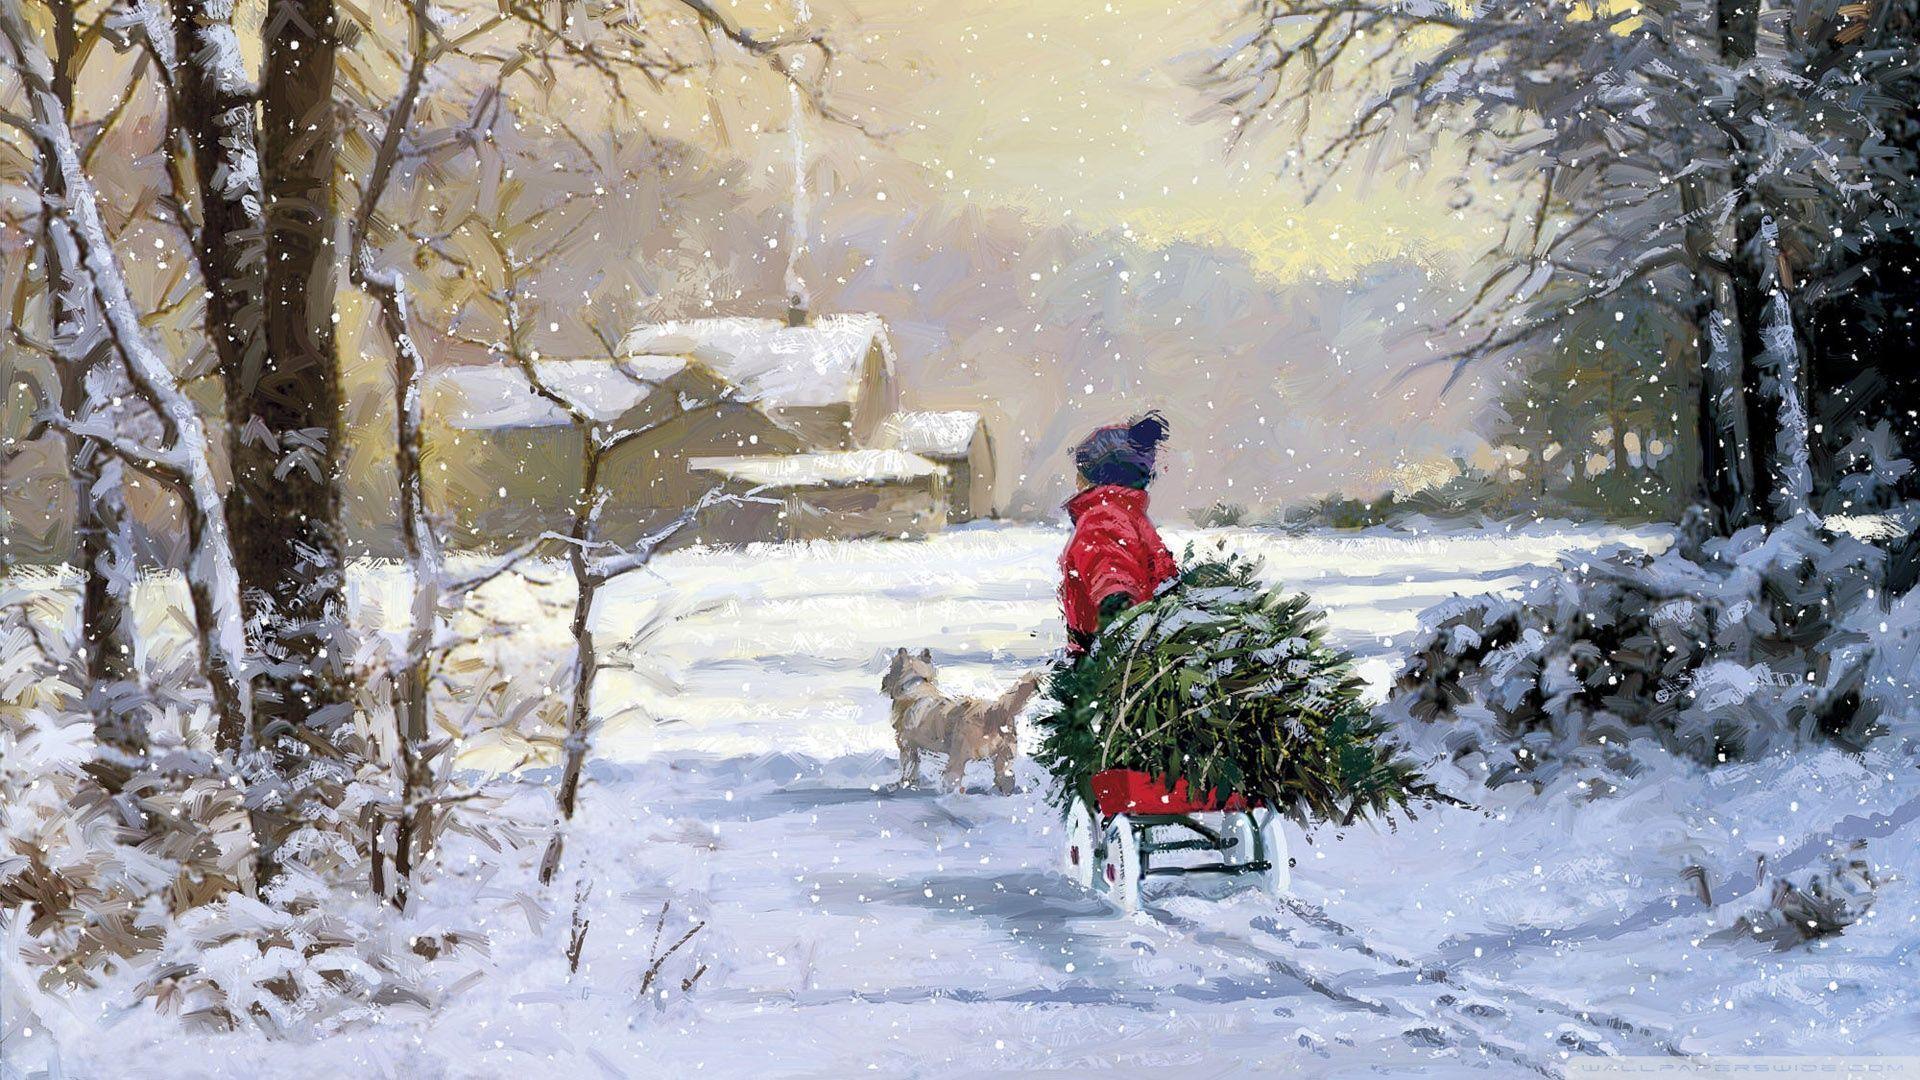 Vintage Winter Wallpapers - Top Free ...